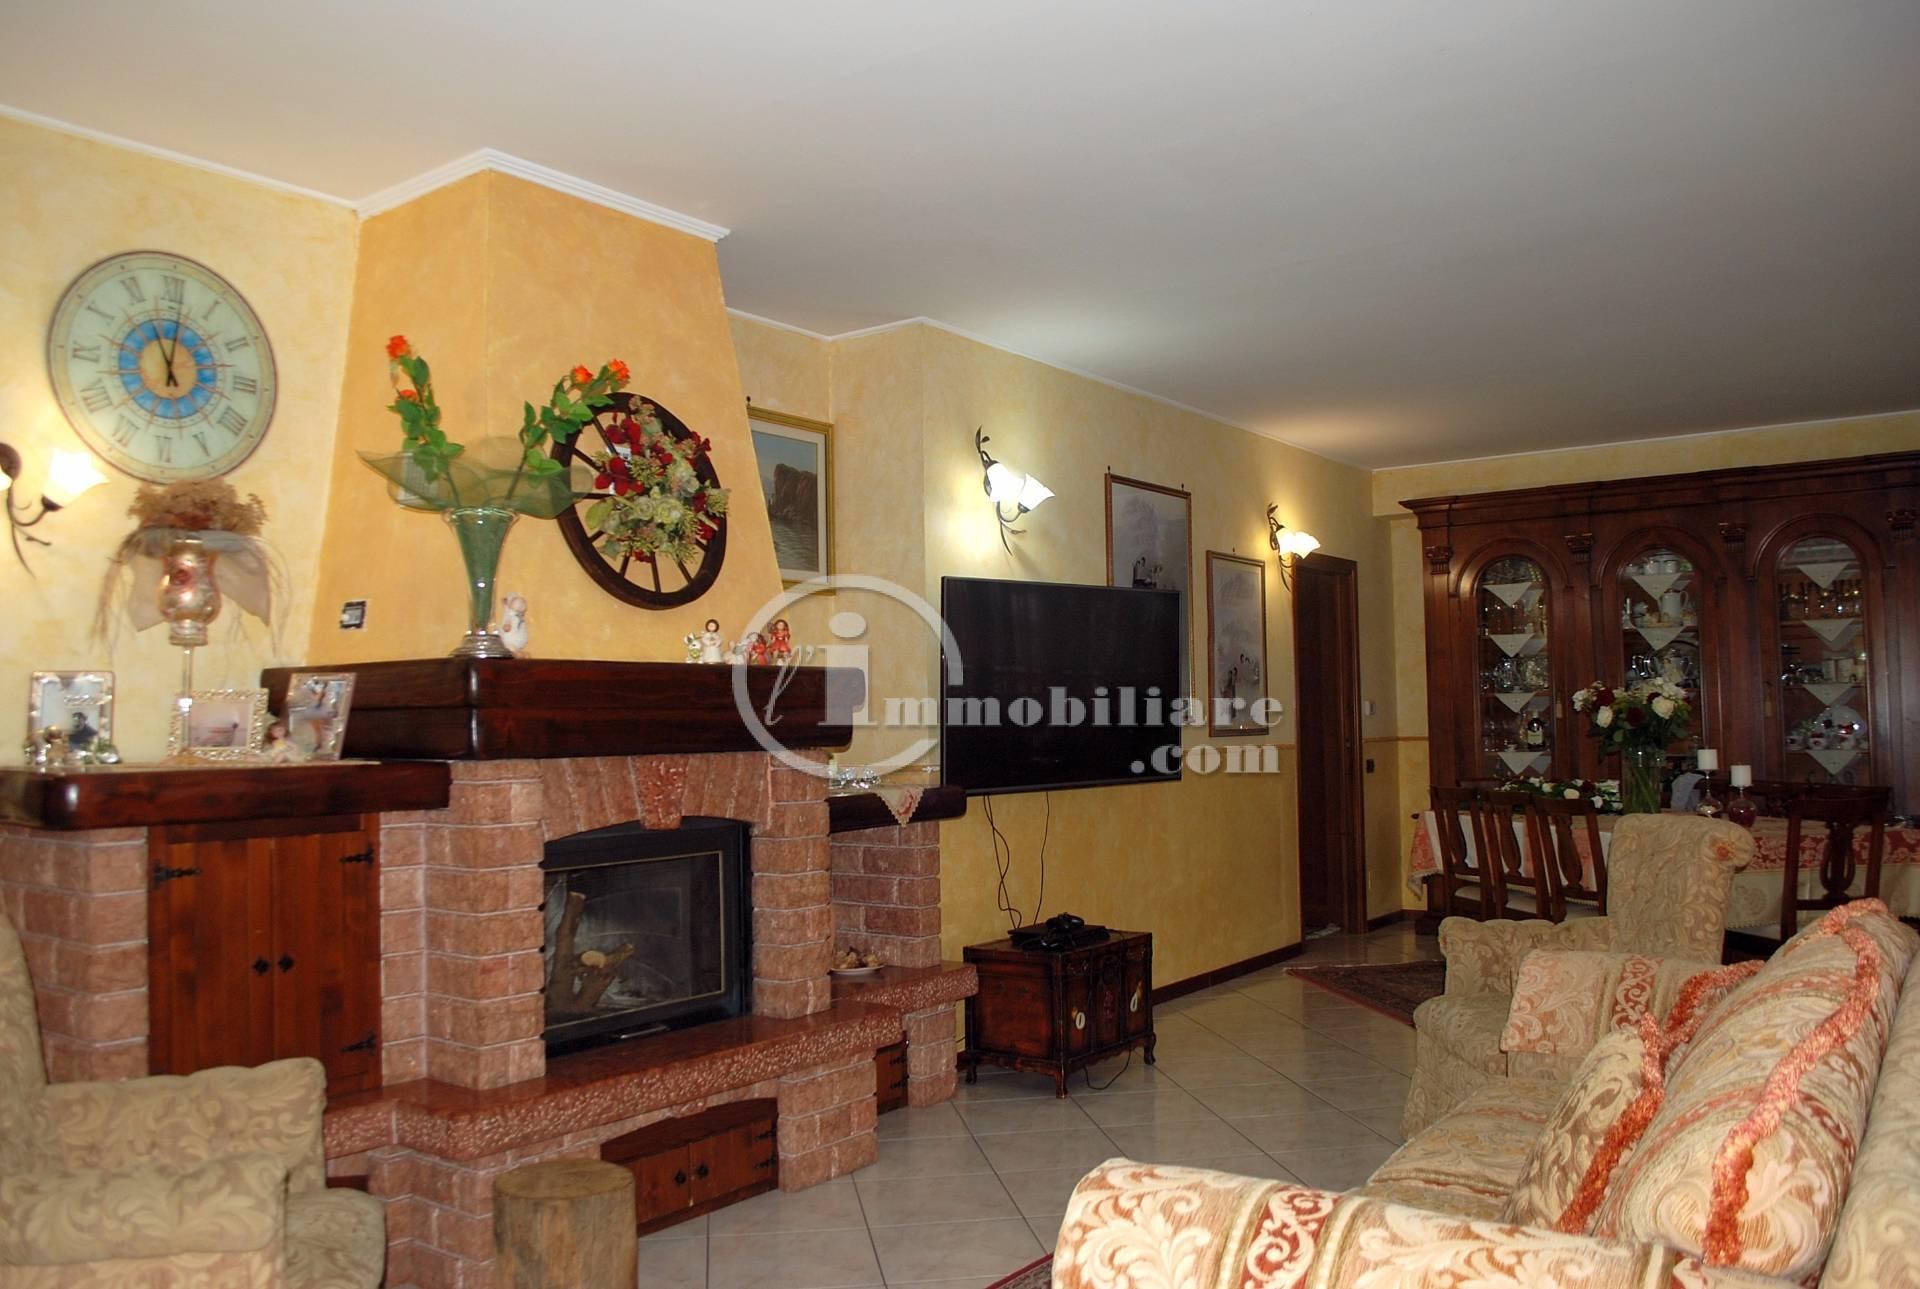 Buccinasco | Appartamento in Vendita in Via Duse | lacasadimilano.it